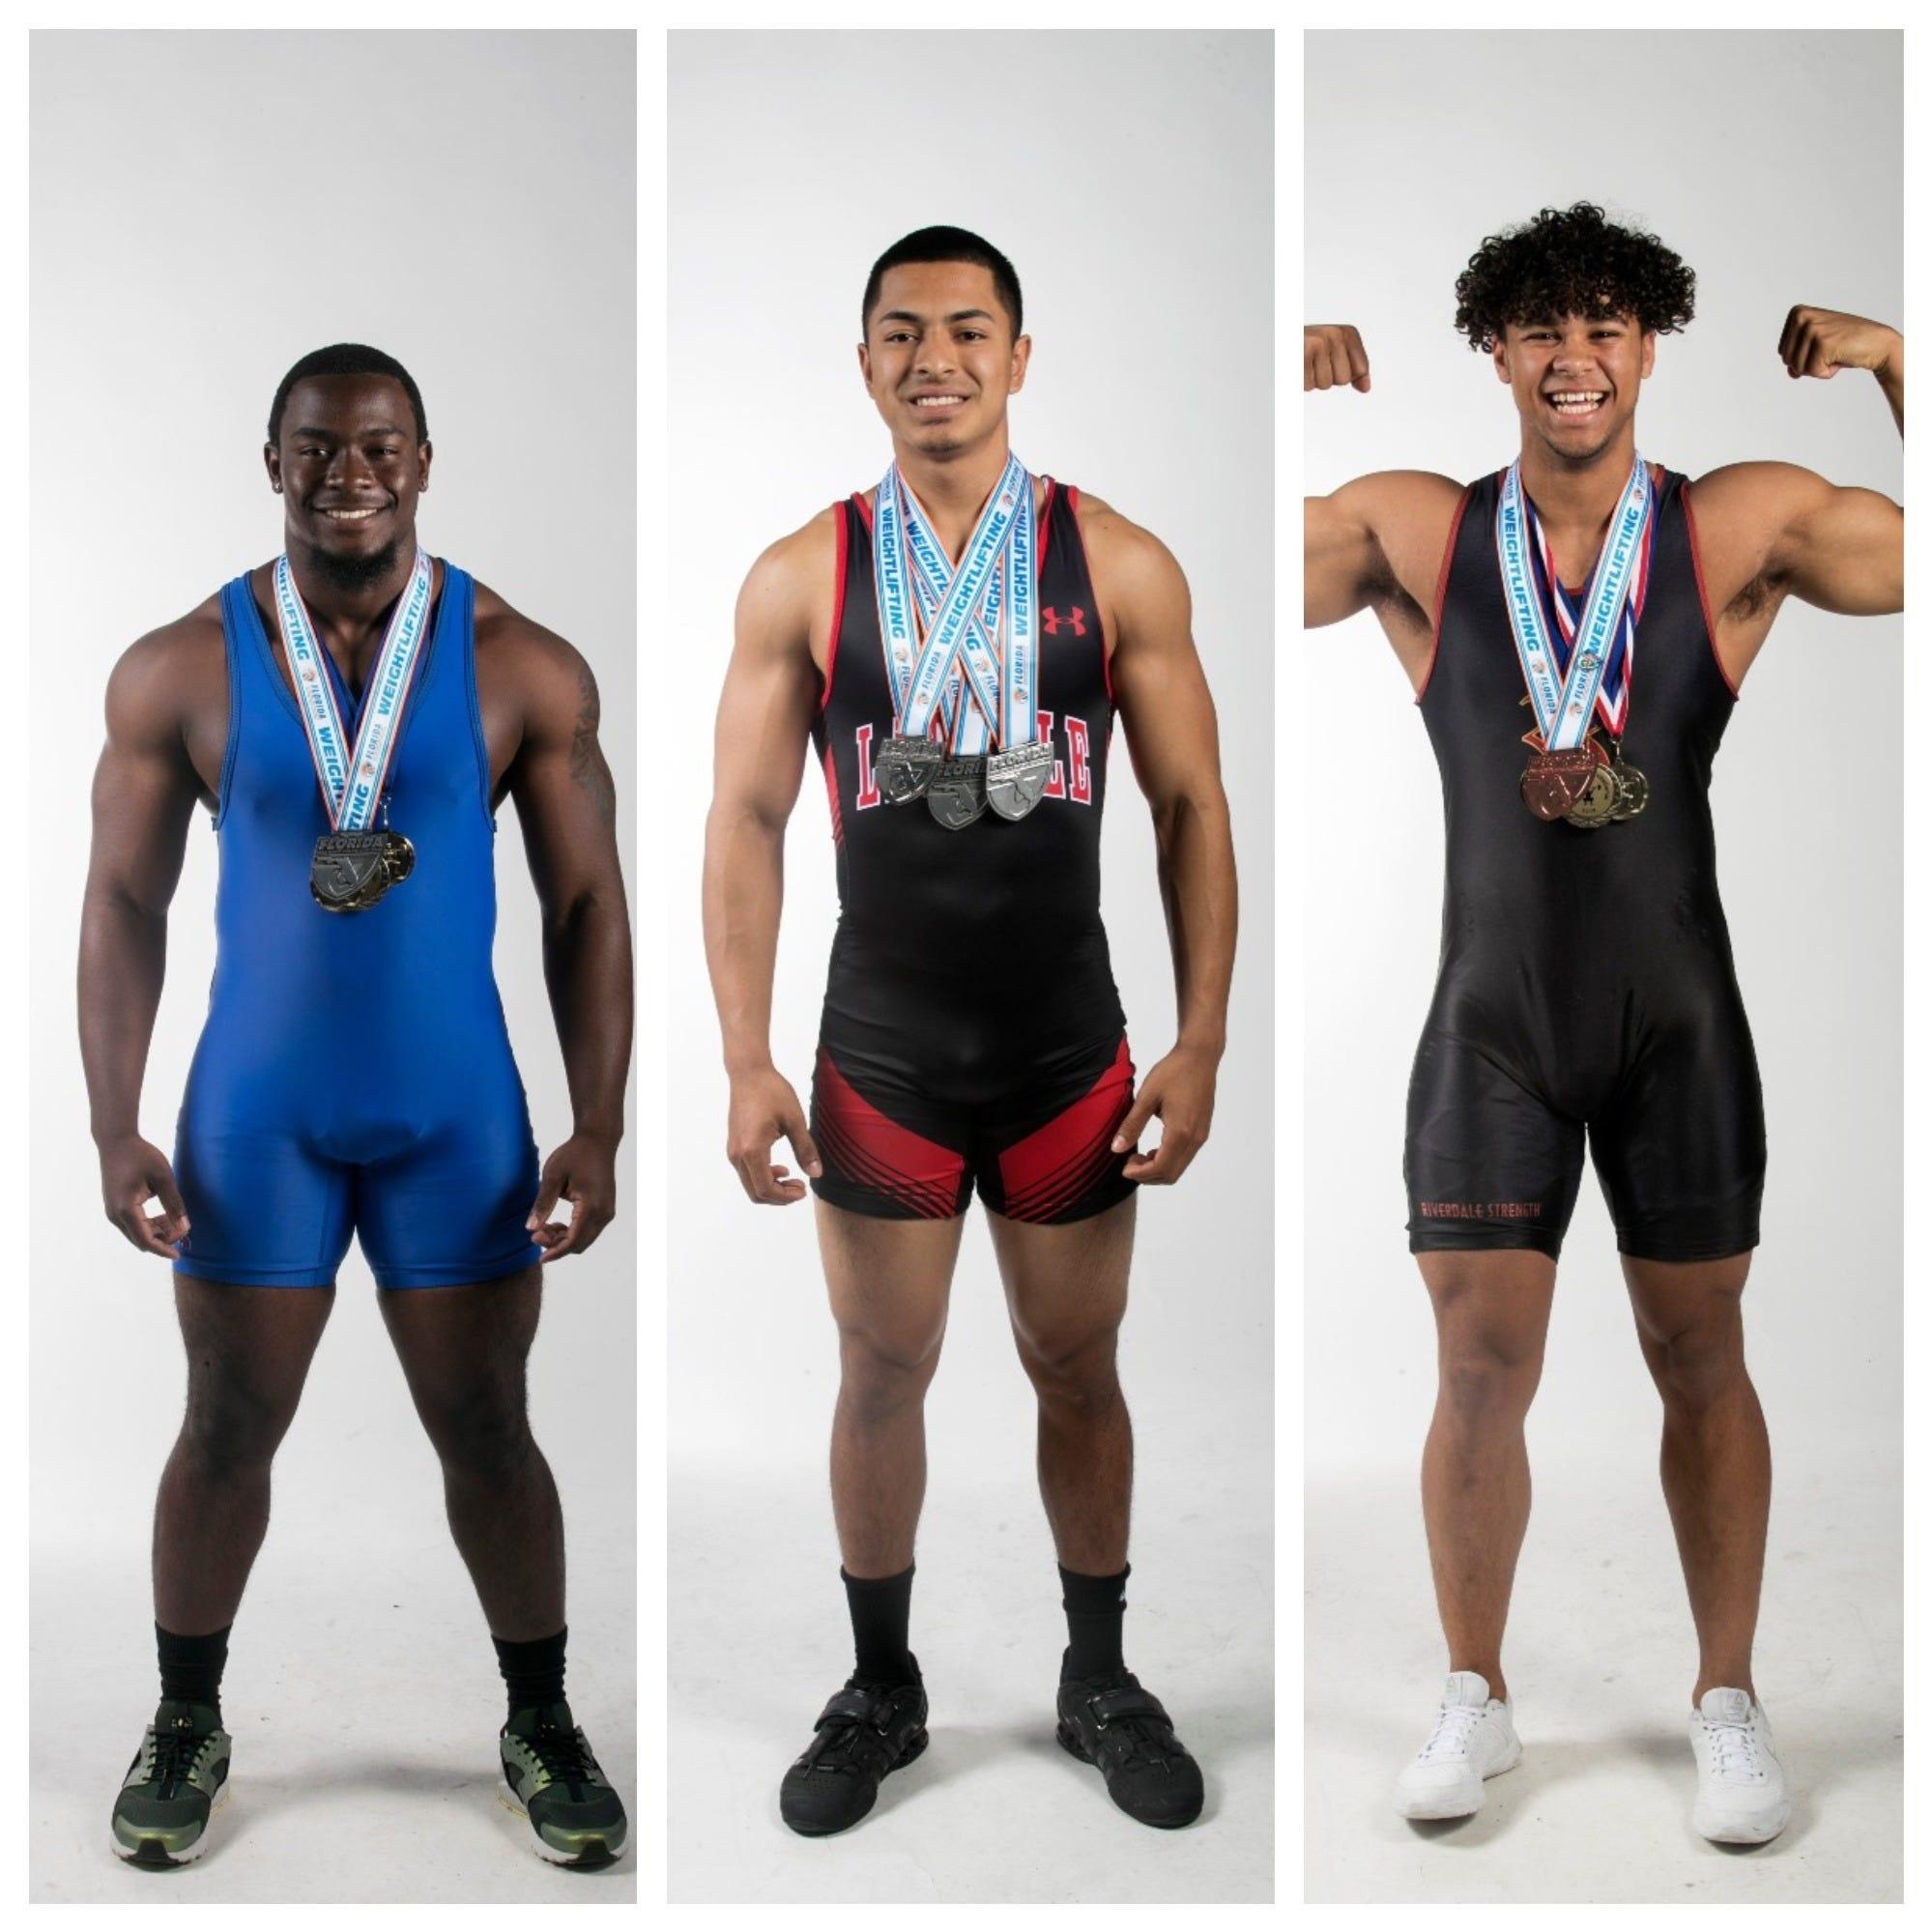 The News-Press 2019 Boys Weightlifting Team